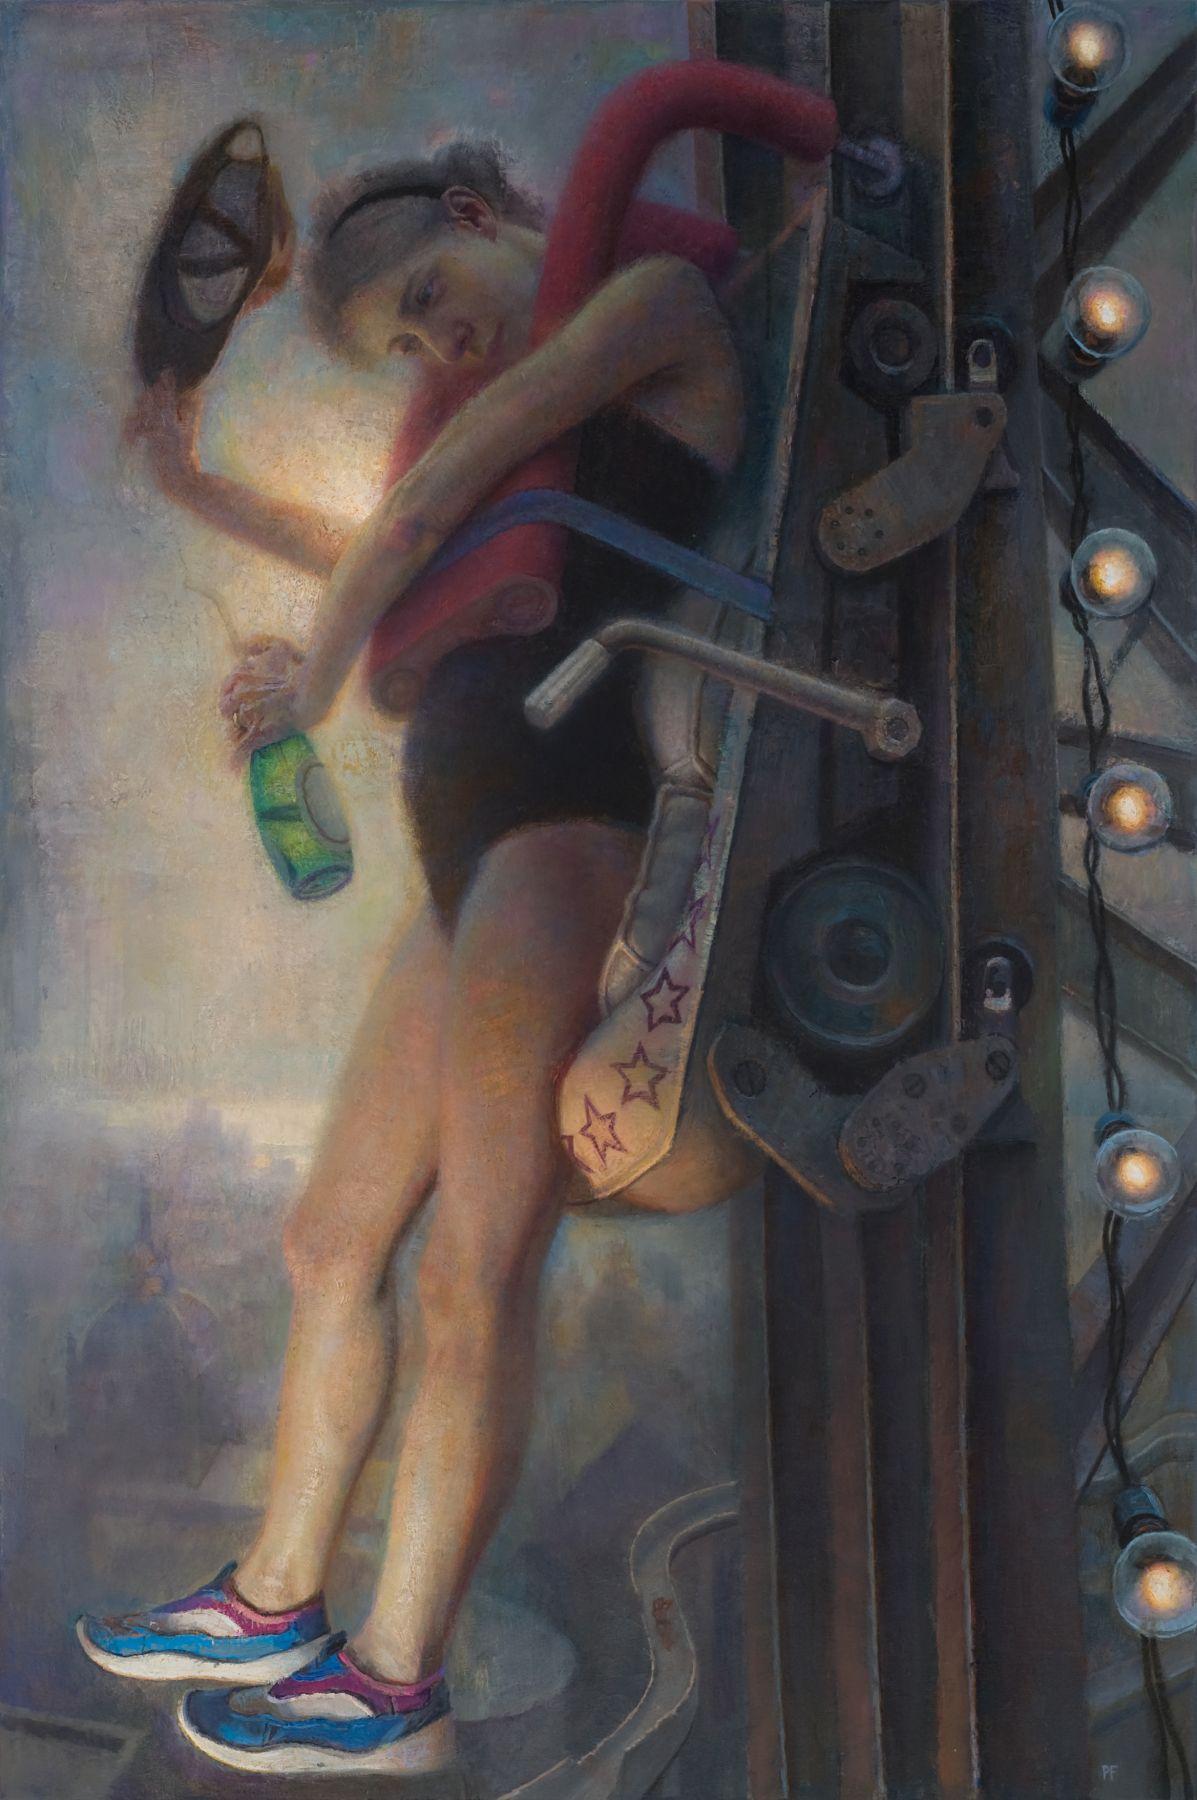 paul fenniak, Theme Park Patron (SOLD), 2014, oil on canvas, 54 x 36 inches